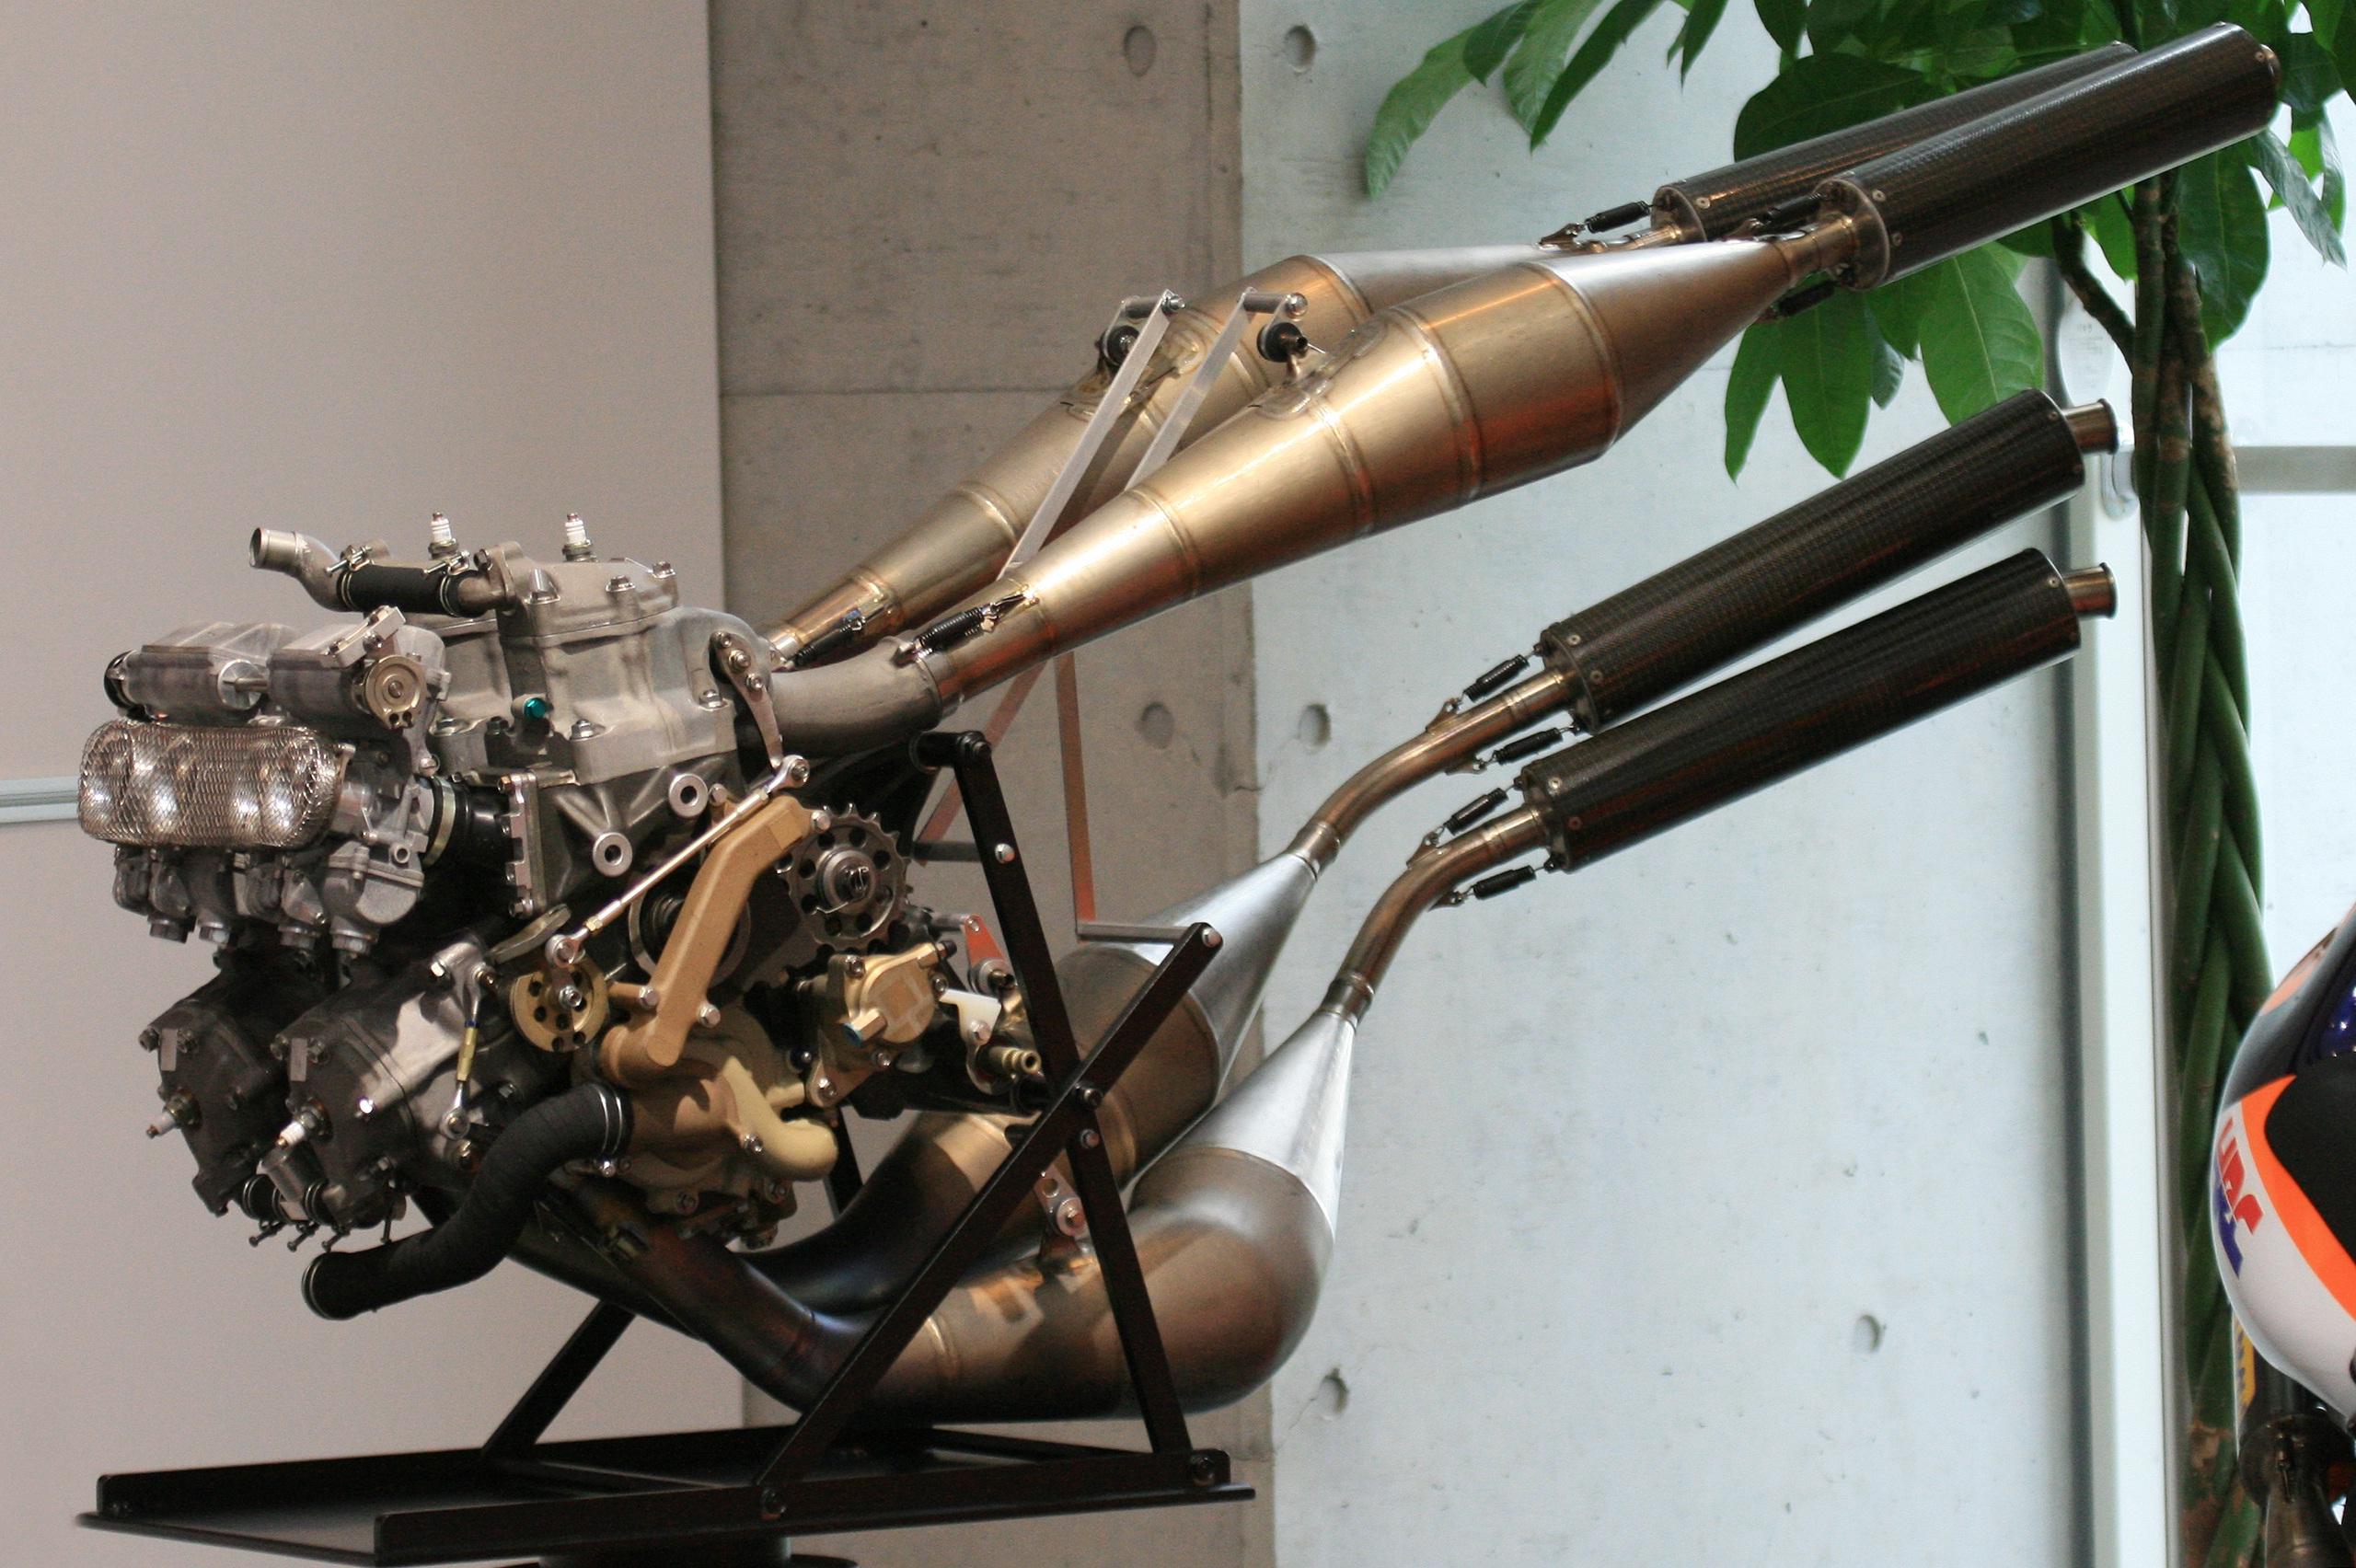 347 Honda NS R500 motor